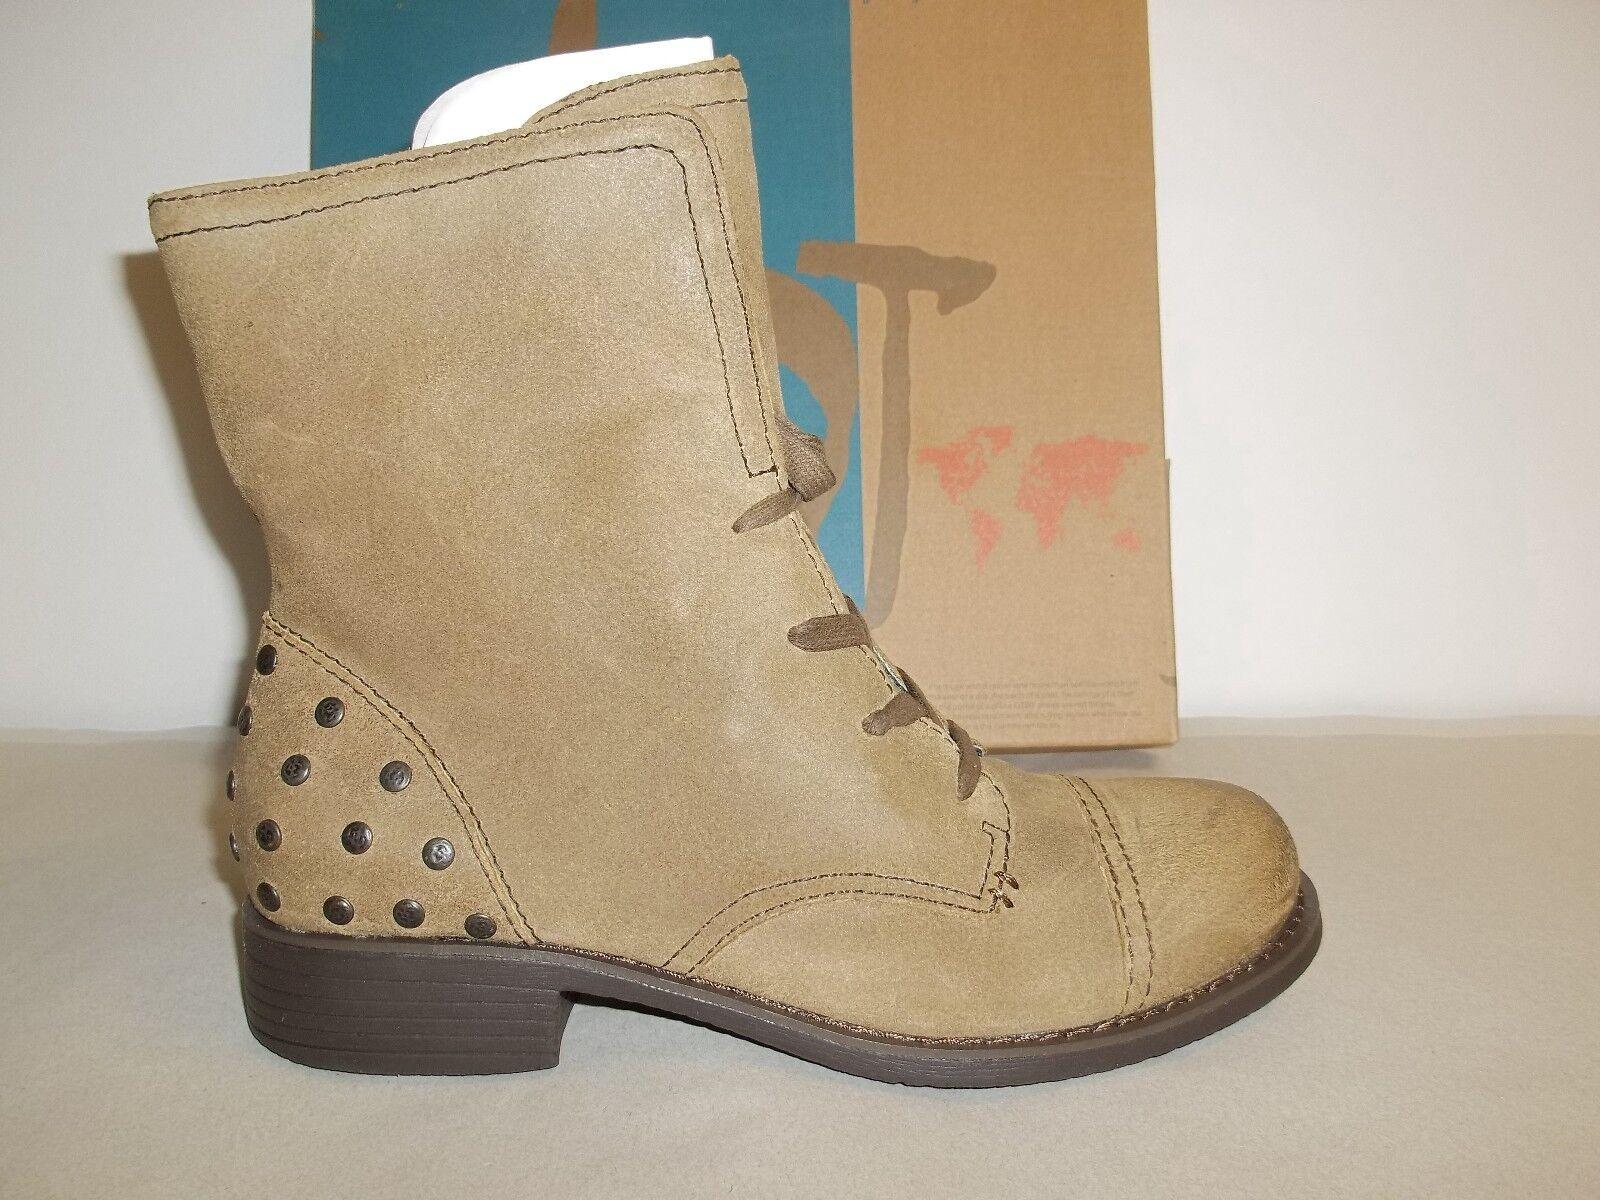 OTBT Größe 8.5 M Bridgeman Braun Distressed Leder Ankle Boats NEU Damenschuhe Schuhes